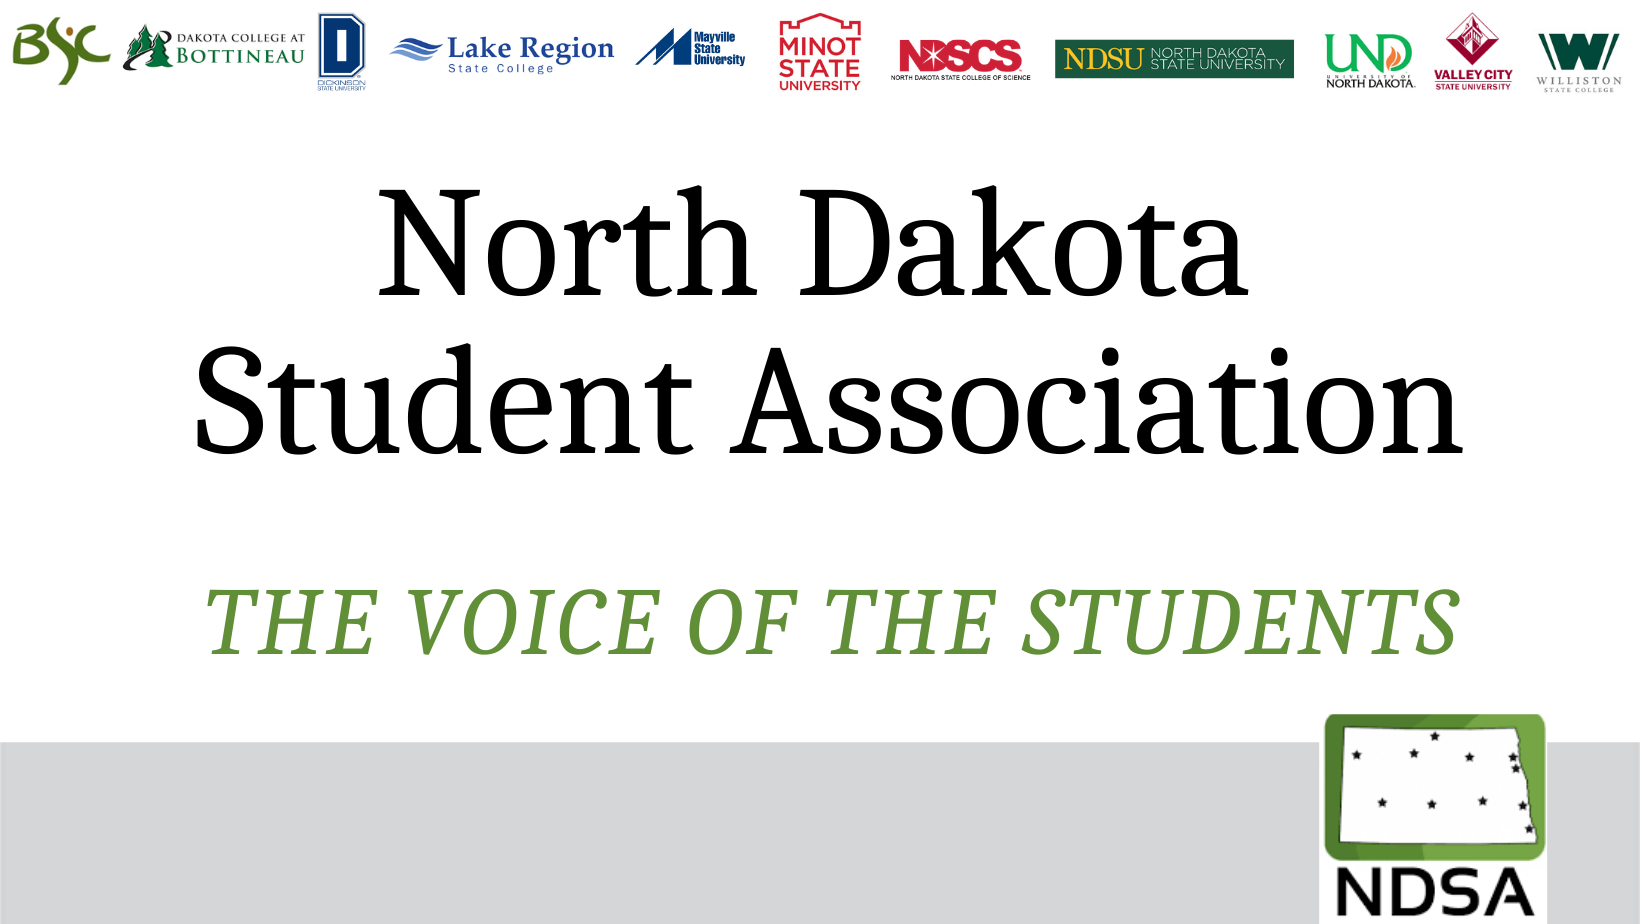 North Dakota Student Association